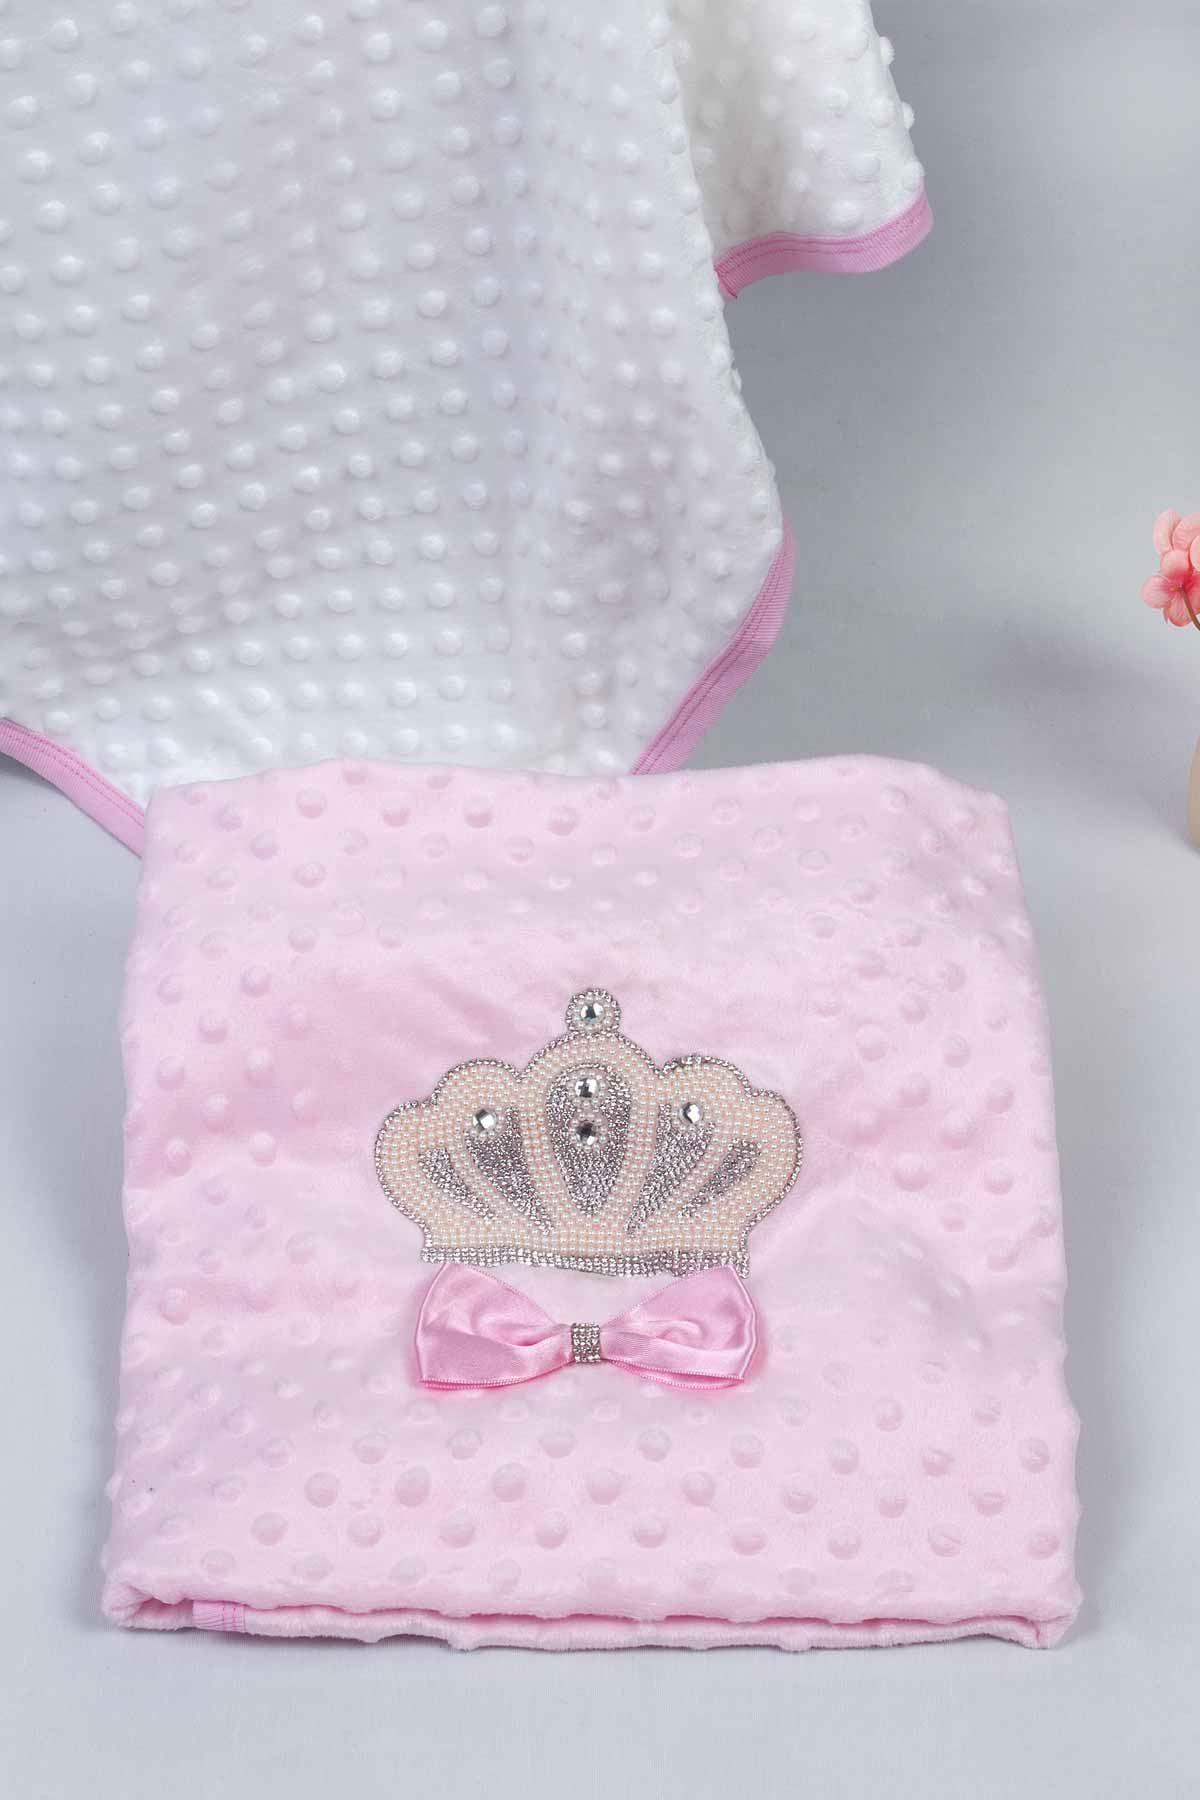 Pink Girl Babies Blanket King Queen Girls Baby Newborn Crown Embossed Ultra Soft Antibacterial Infants Girls Princess Models